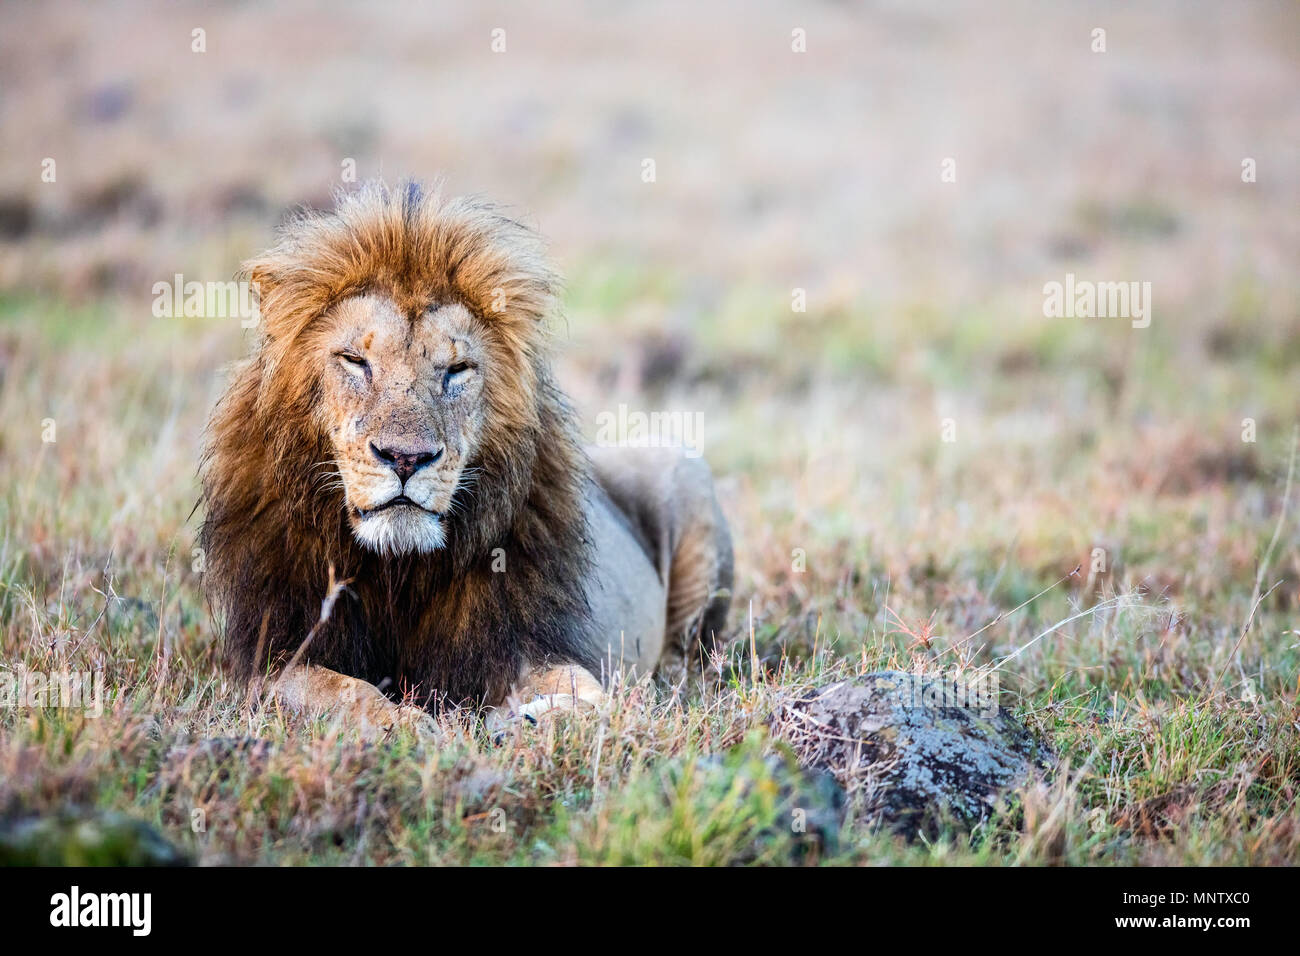 Lion Stock Photos & Lion Stock Images - Alamy